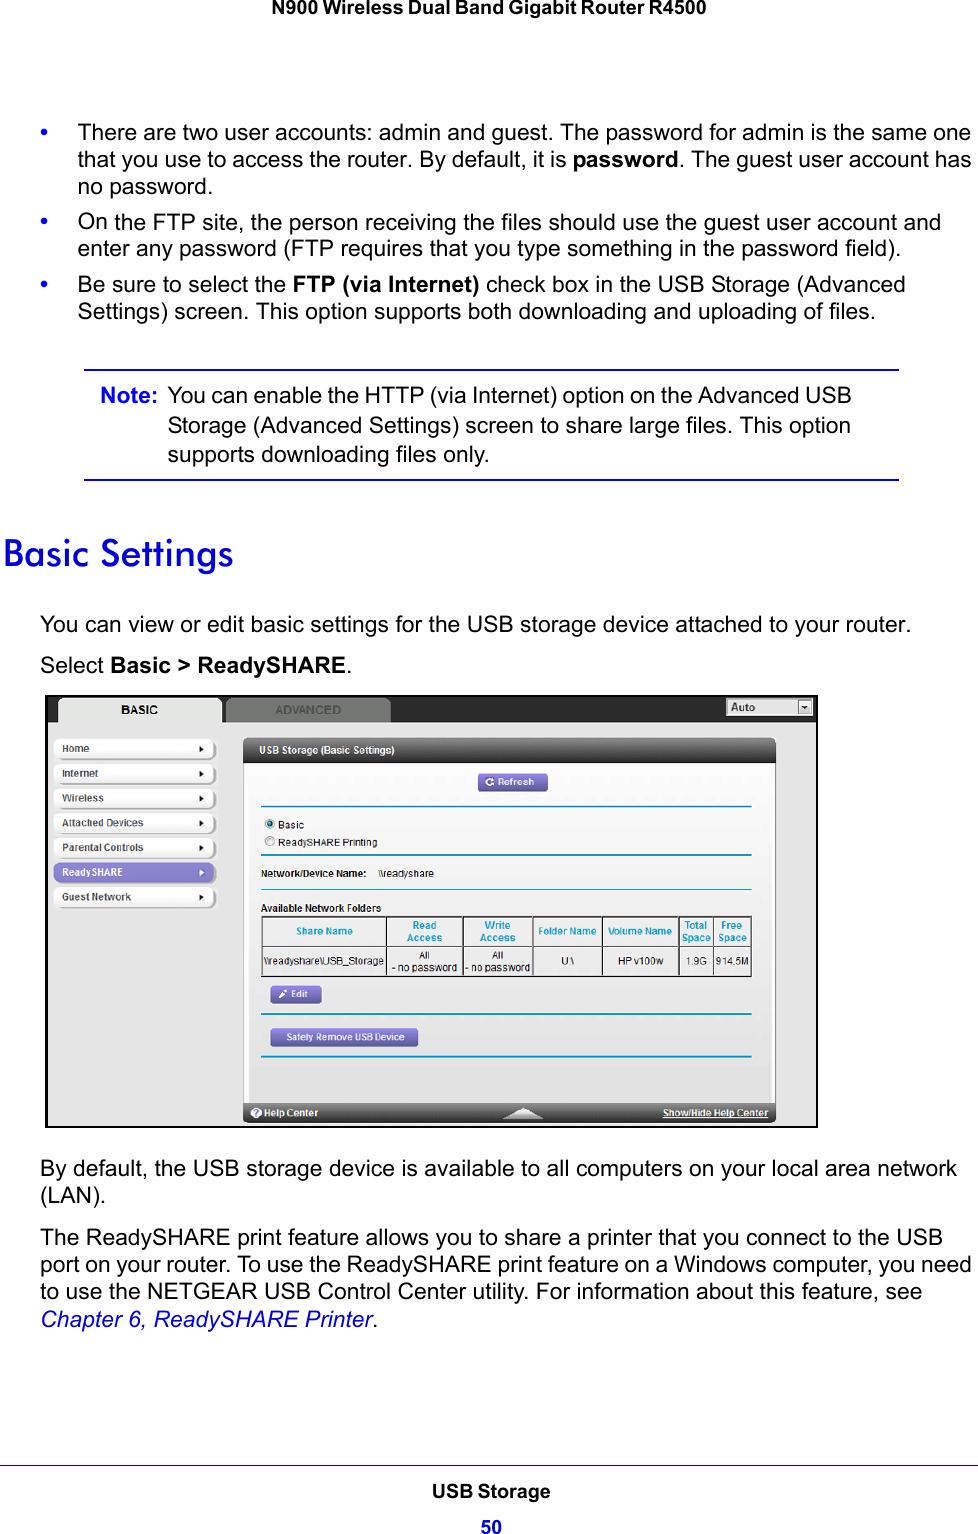 Netgear R4500 Owner S Manual N900 Wireless Dual Band Gigabit